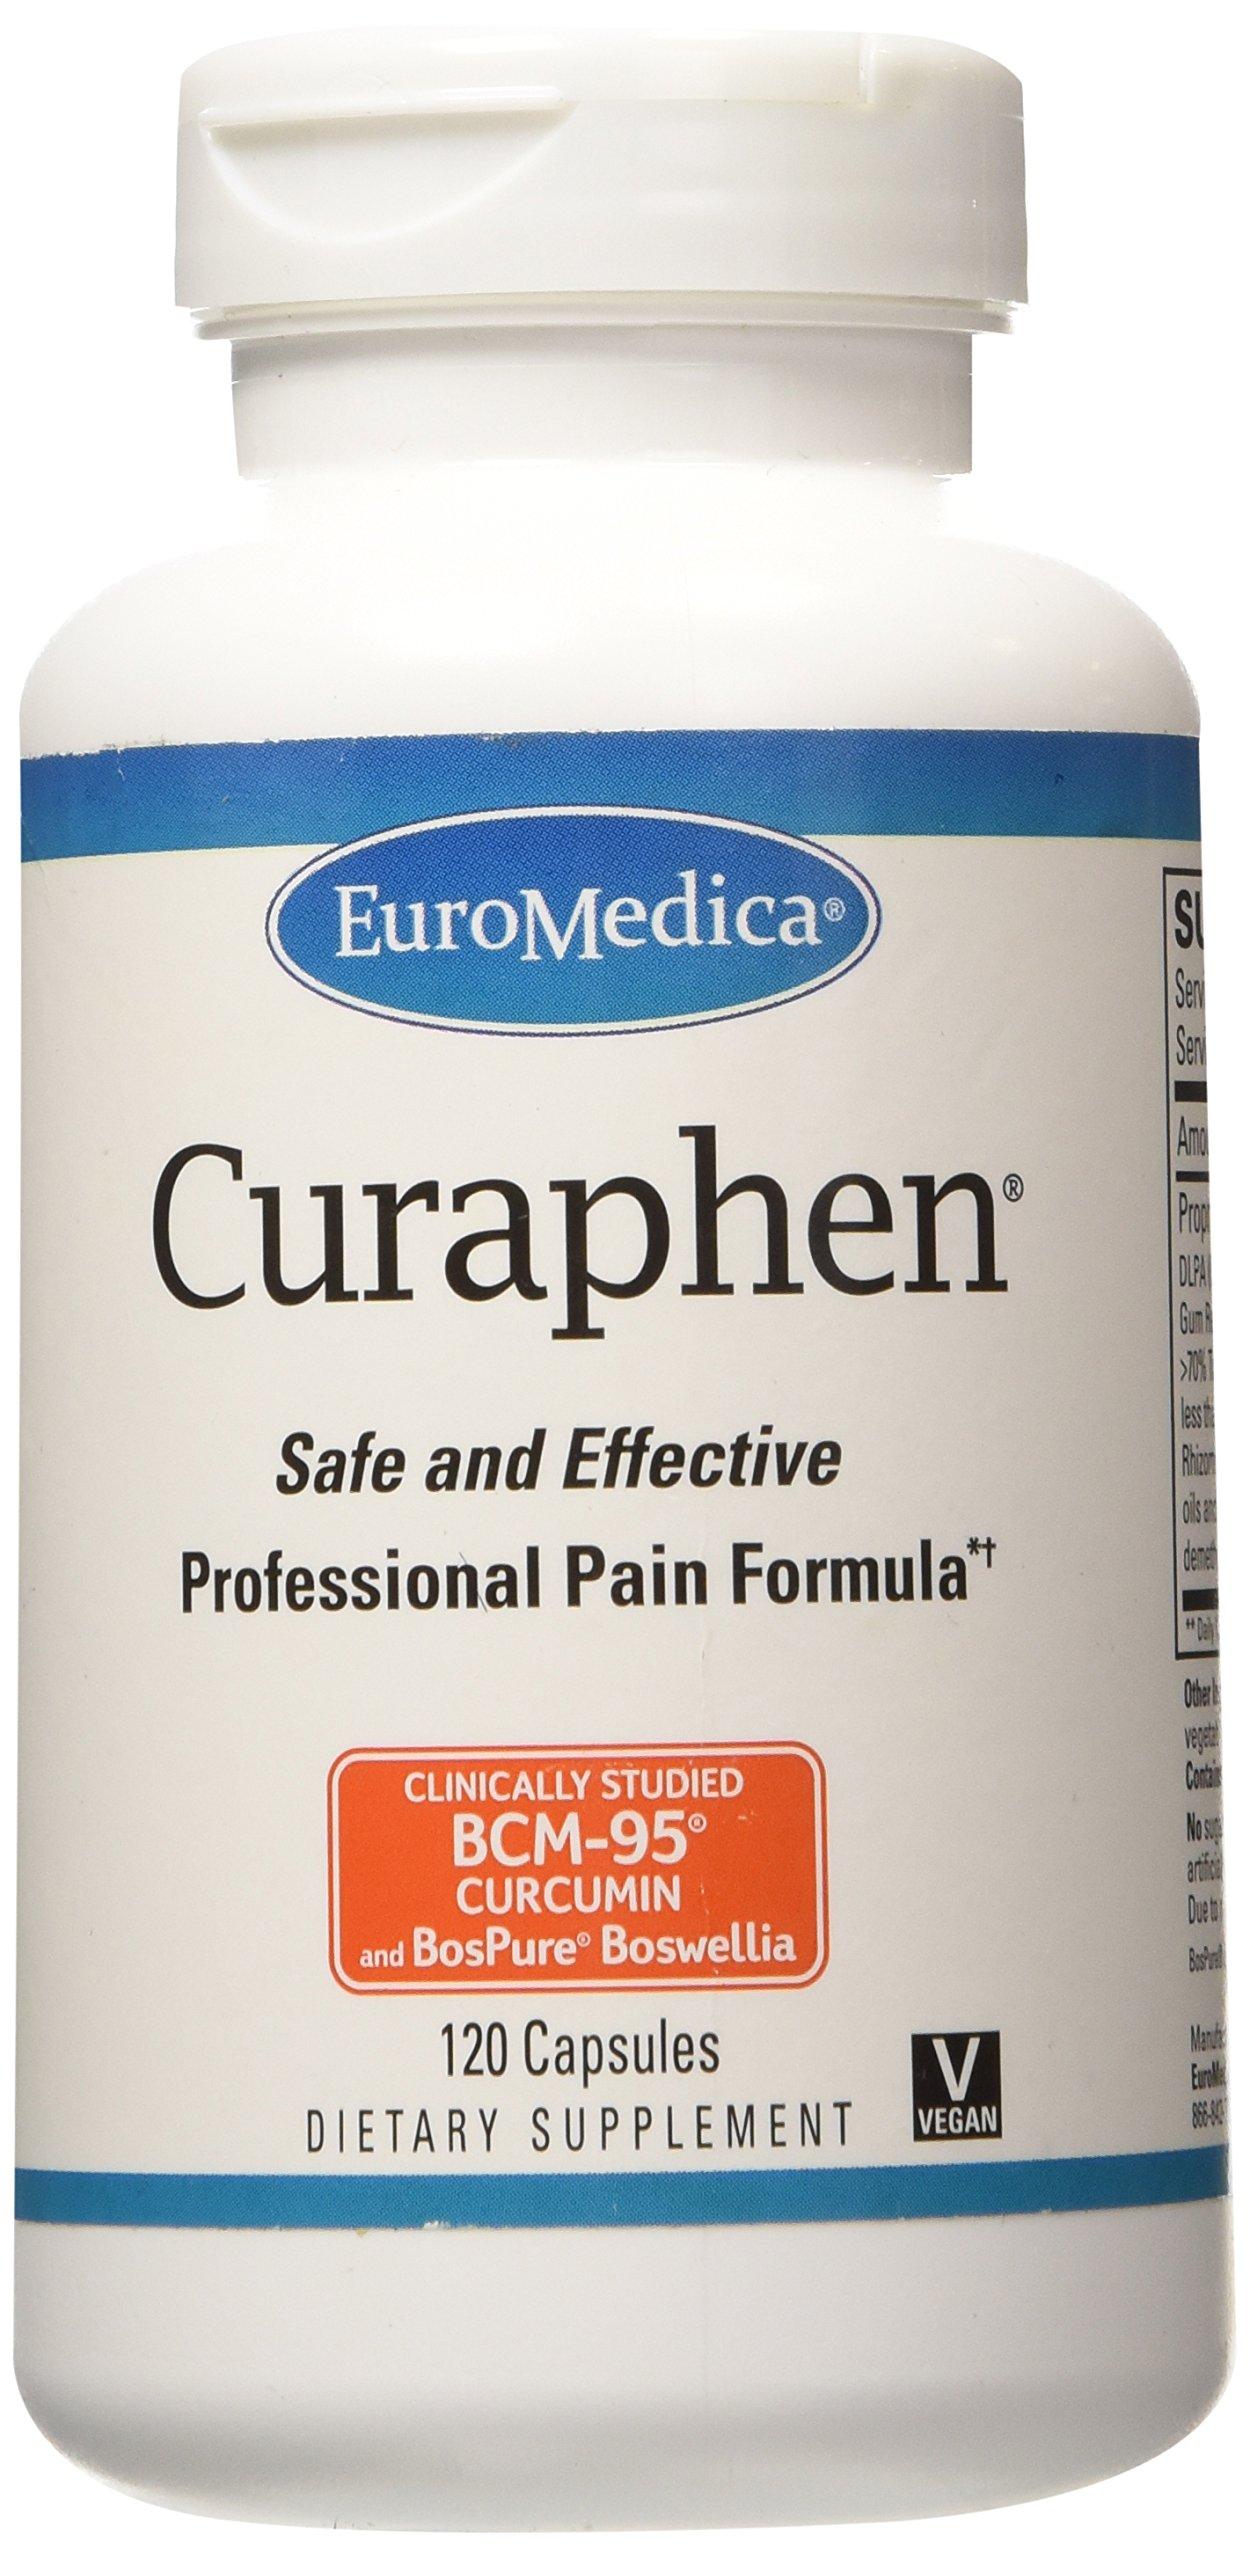 Euromedica Curaphen Vitamin Supplement, 120 Count